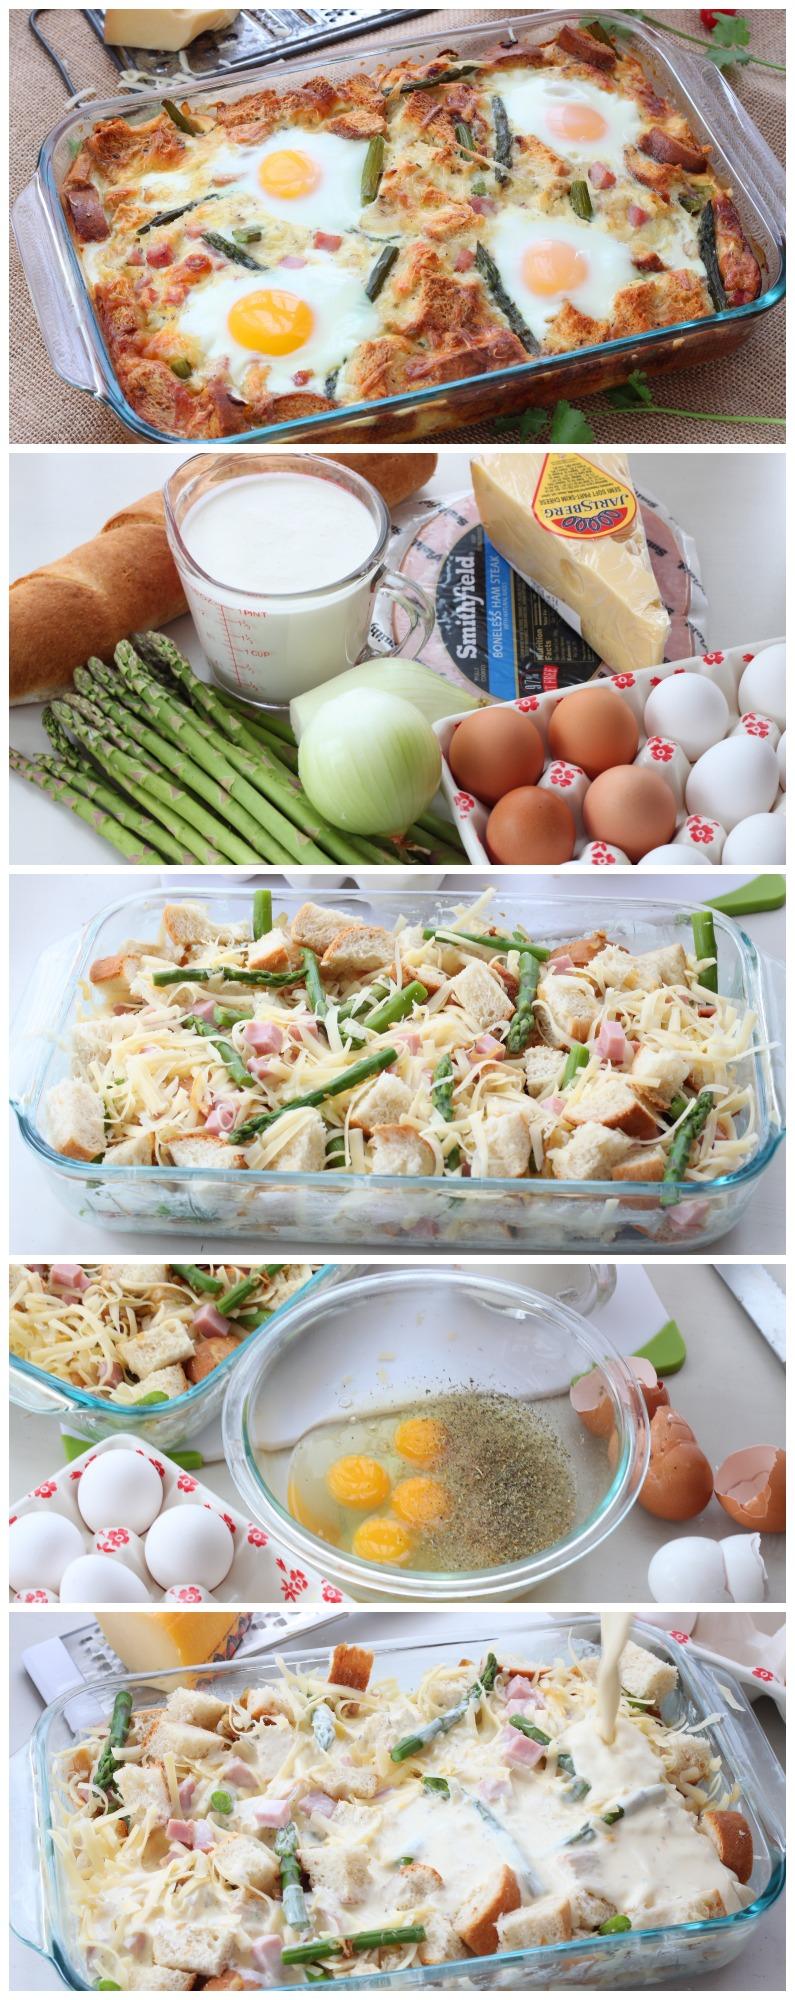 strataCaramelized onion and asparagus strata